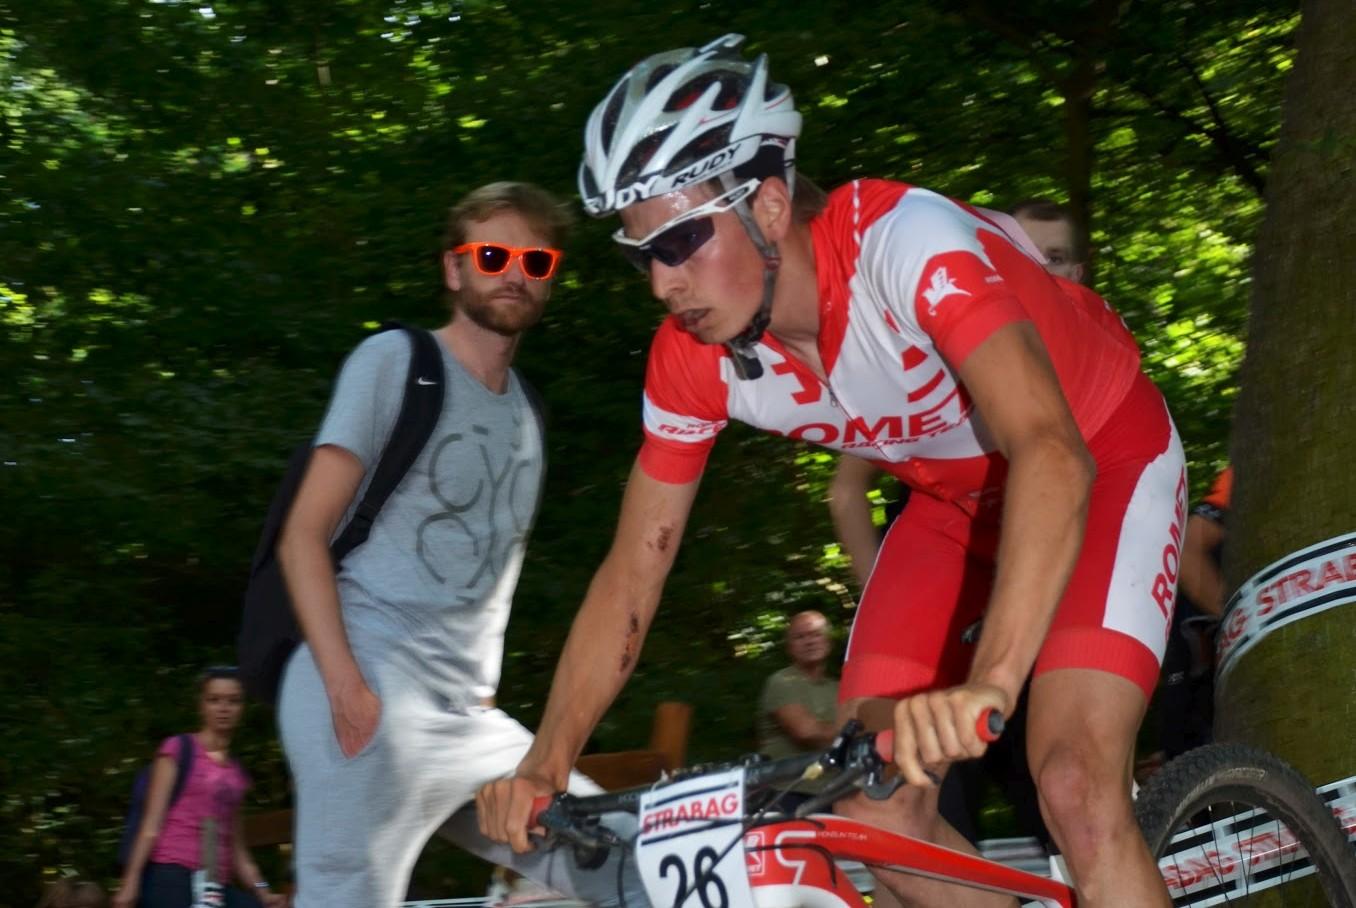 Maciej Jeziorski (Romet MTB Team) – Puchar Czech XCO, Brno